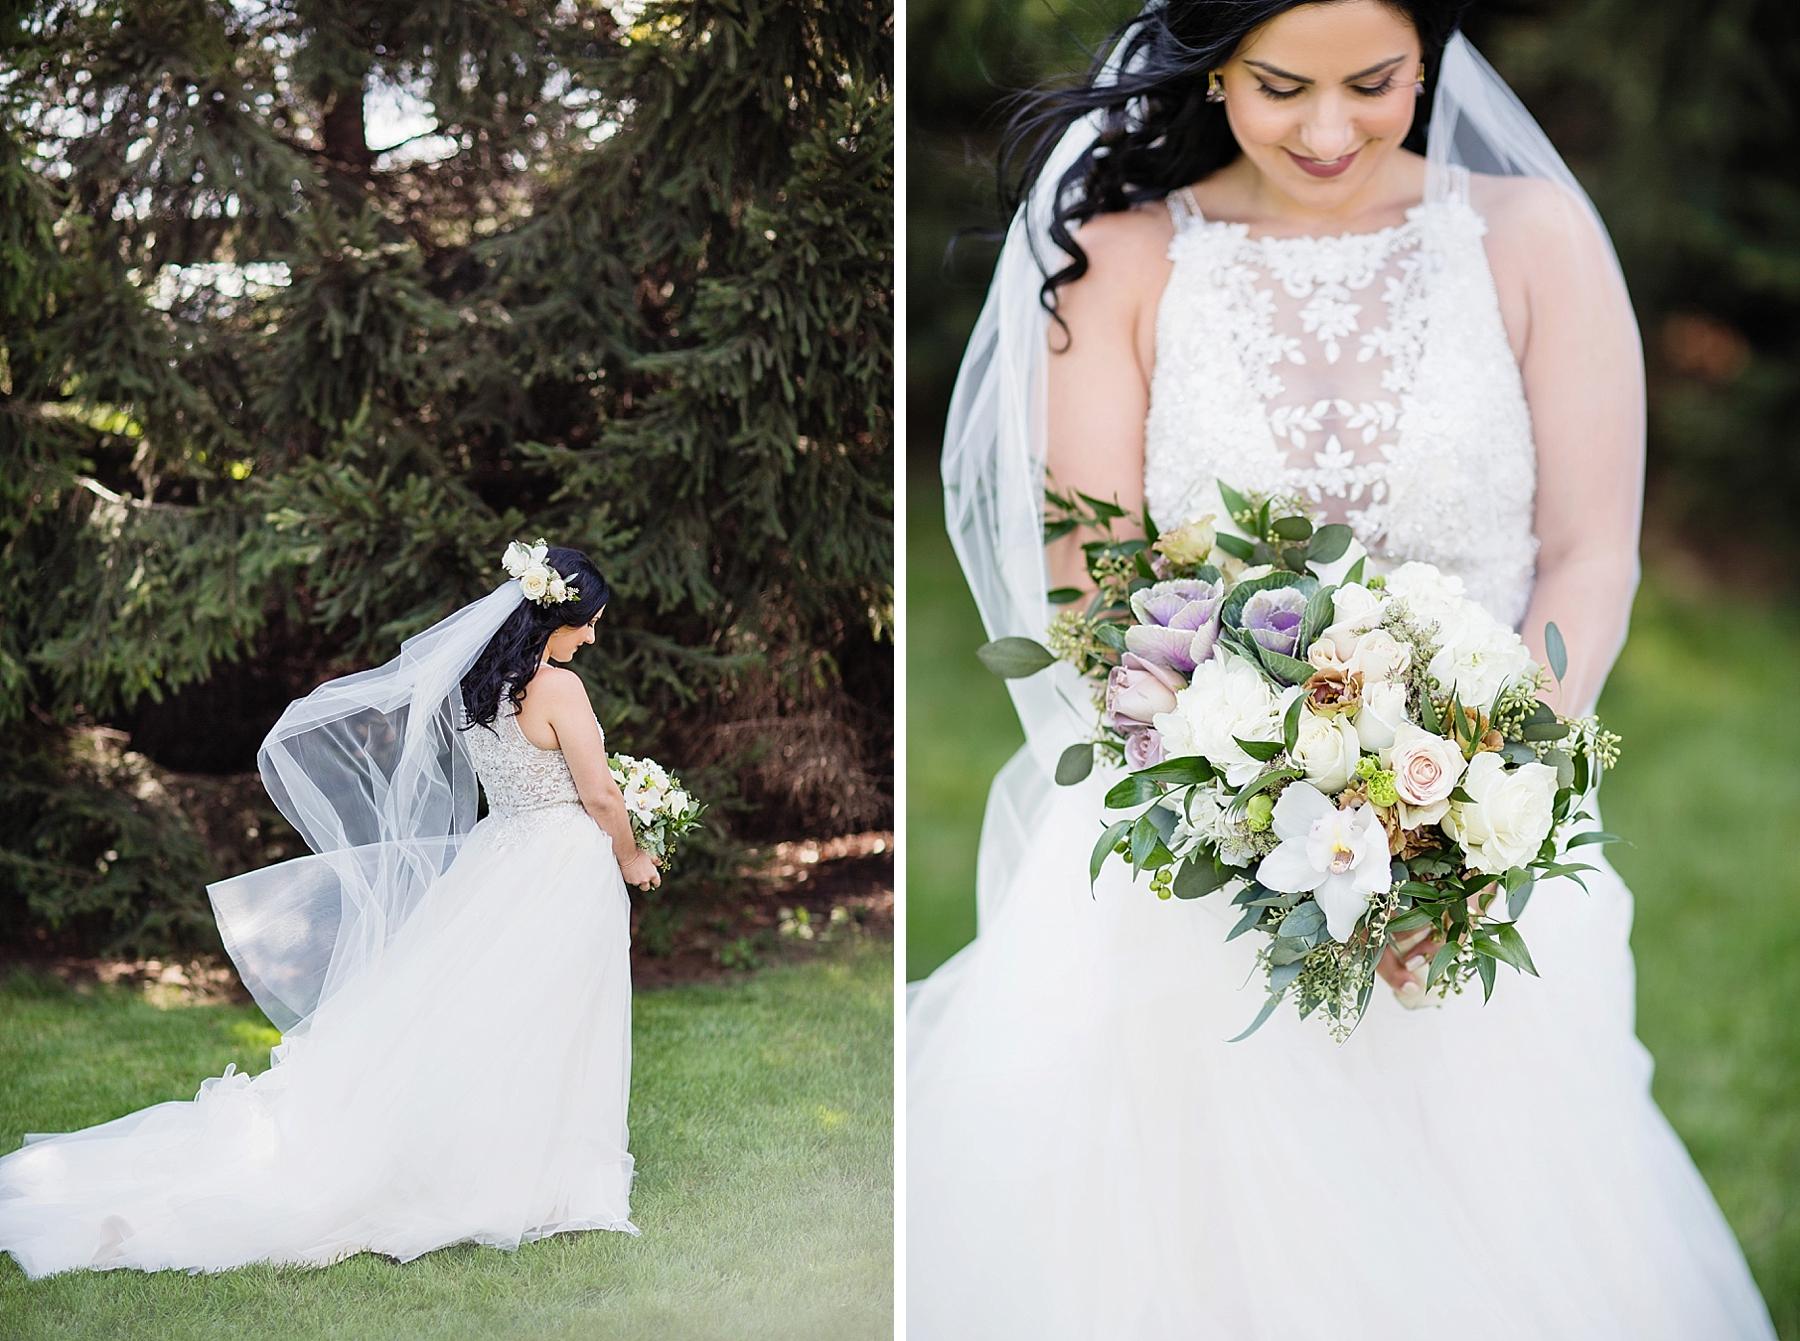 windsor-wedding-photographer-sprucewood-shores-winery-wedding-niagara-on-the-lake-wedding-photographer-eryn-shea-photography_0016.jpg